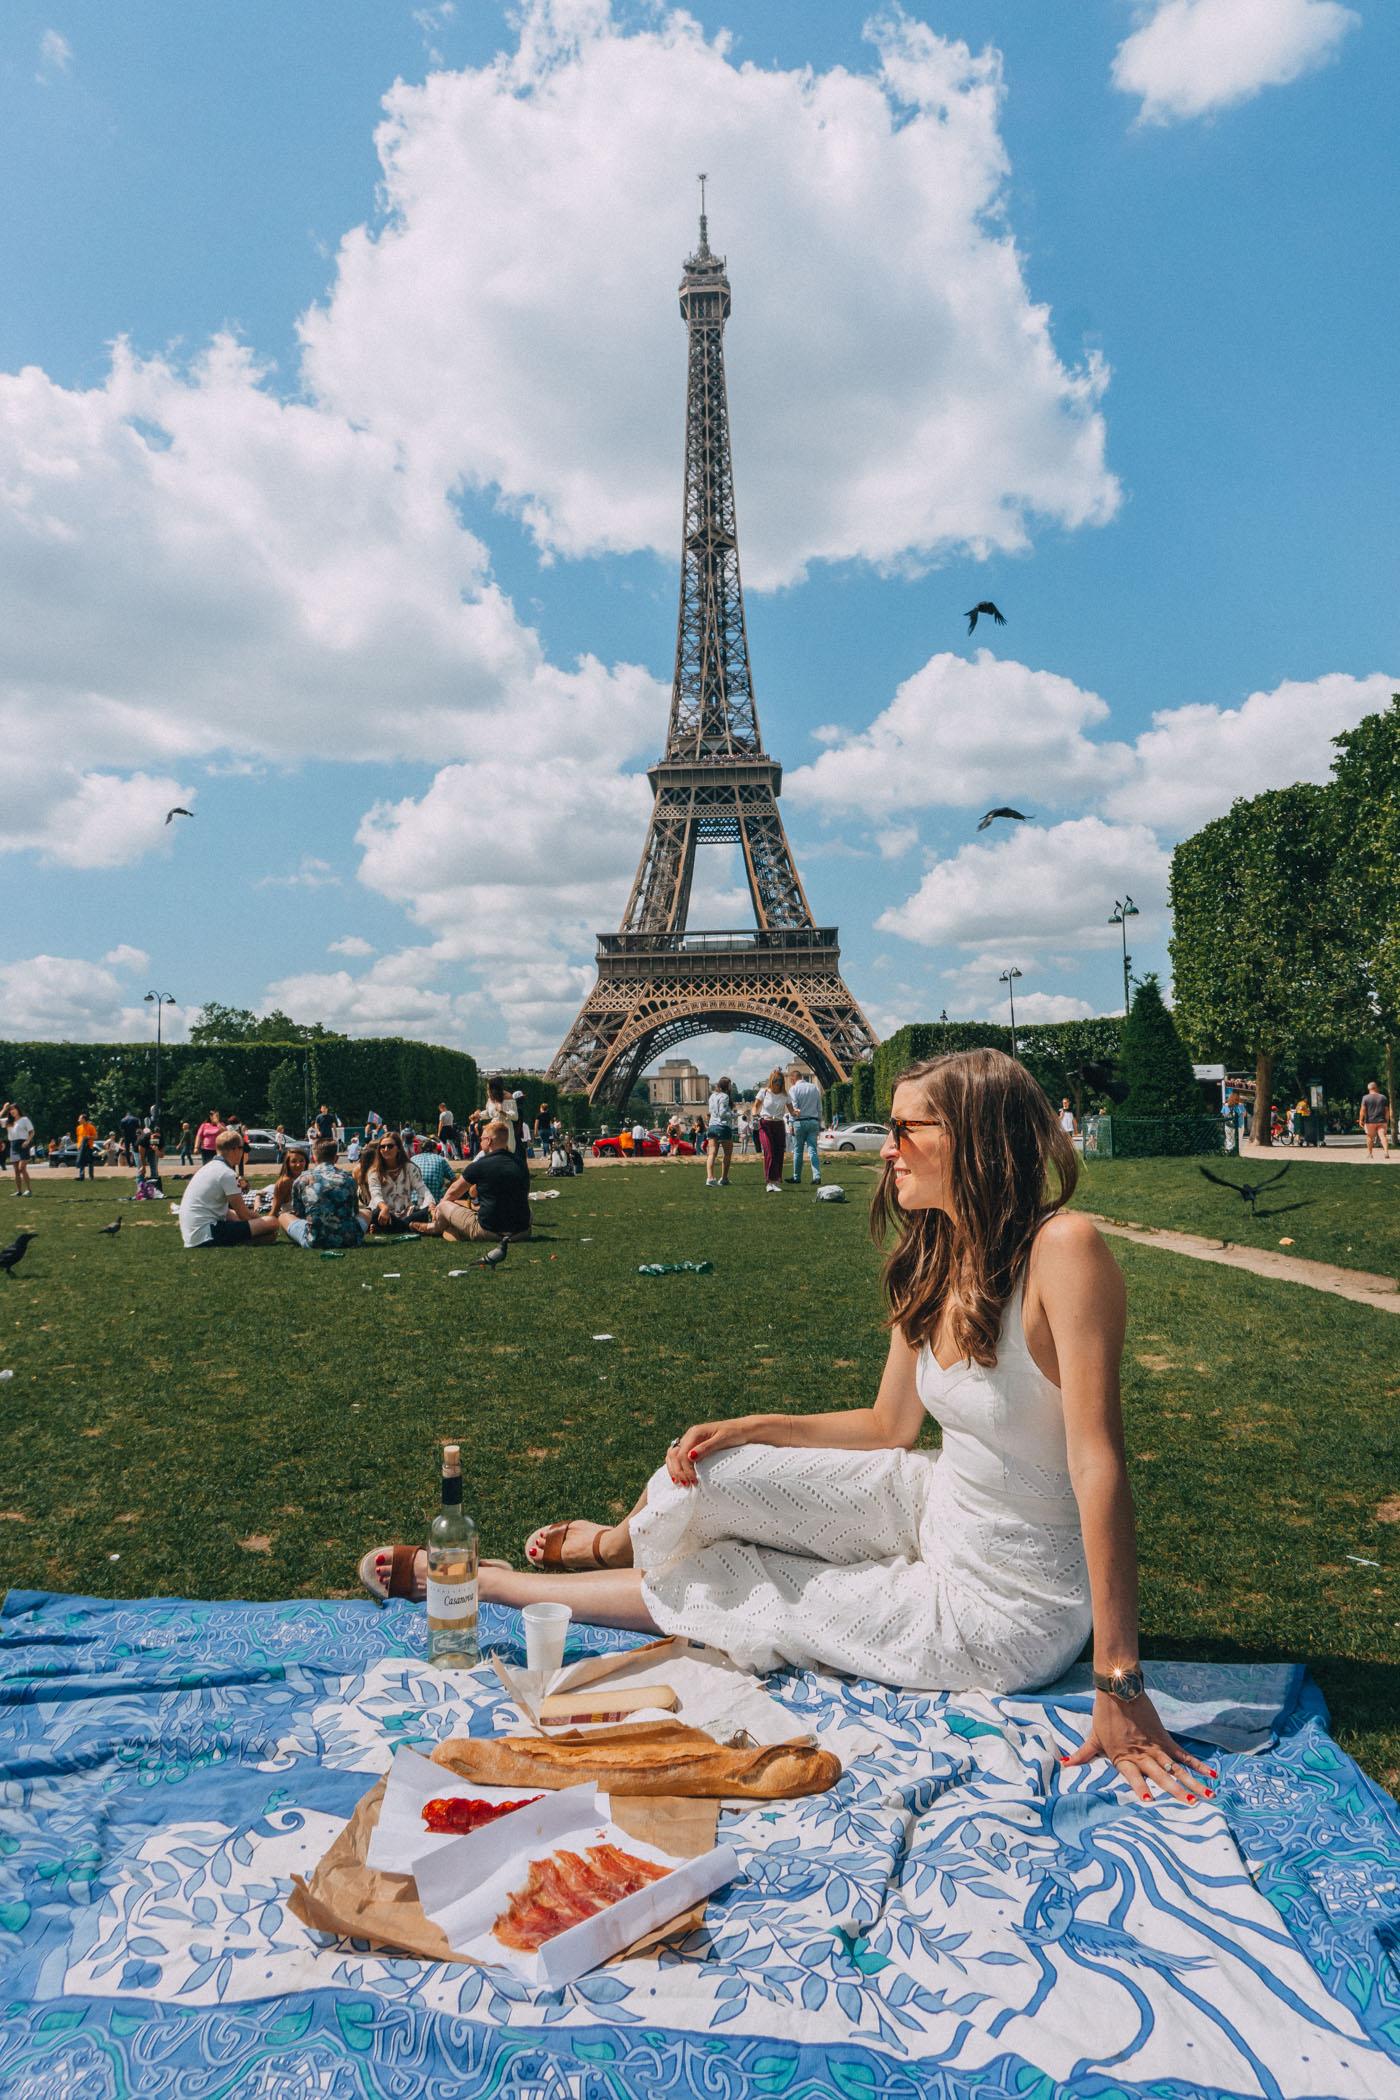 Picnic in Paris under the Eiffel Tower